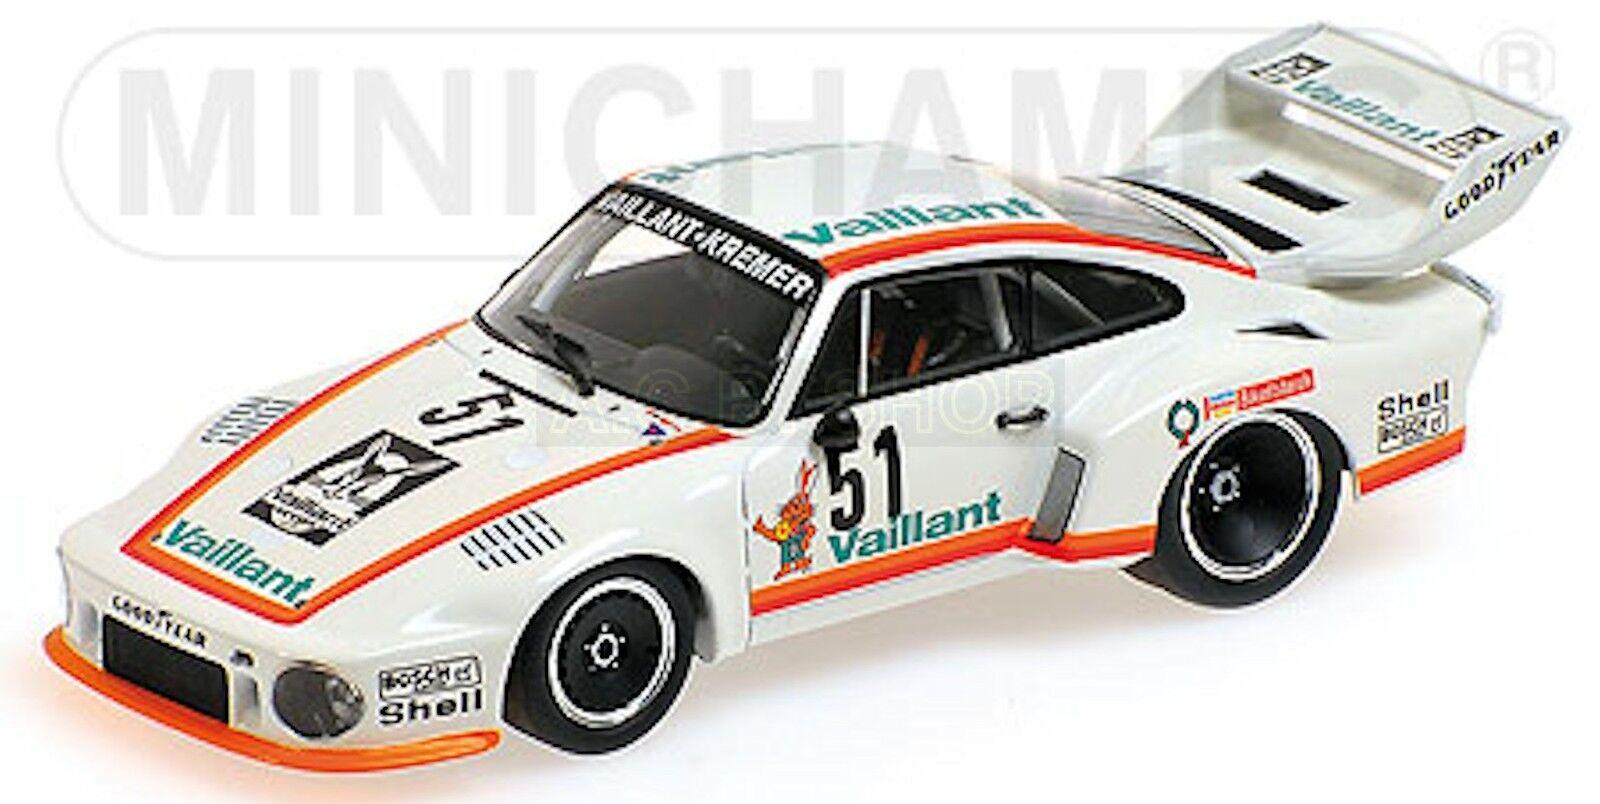 Porsche 935 Drm 1977 Zolder Bob Wollek  51 Vaillant 1 Blanc  43 Minichamps